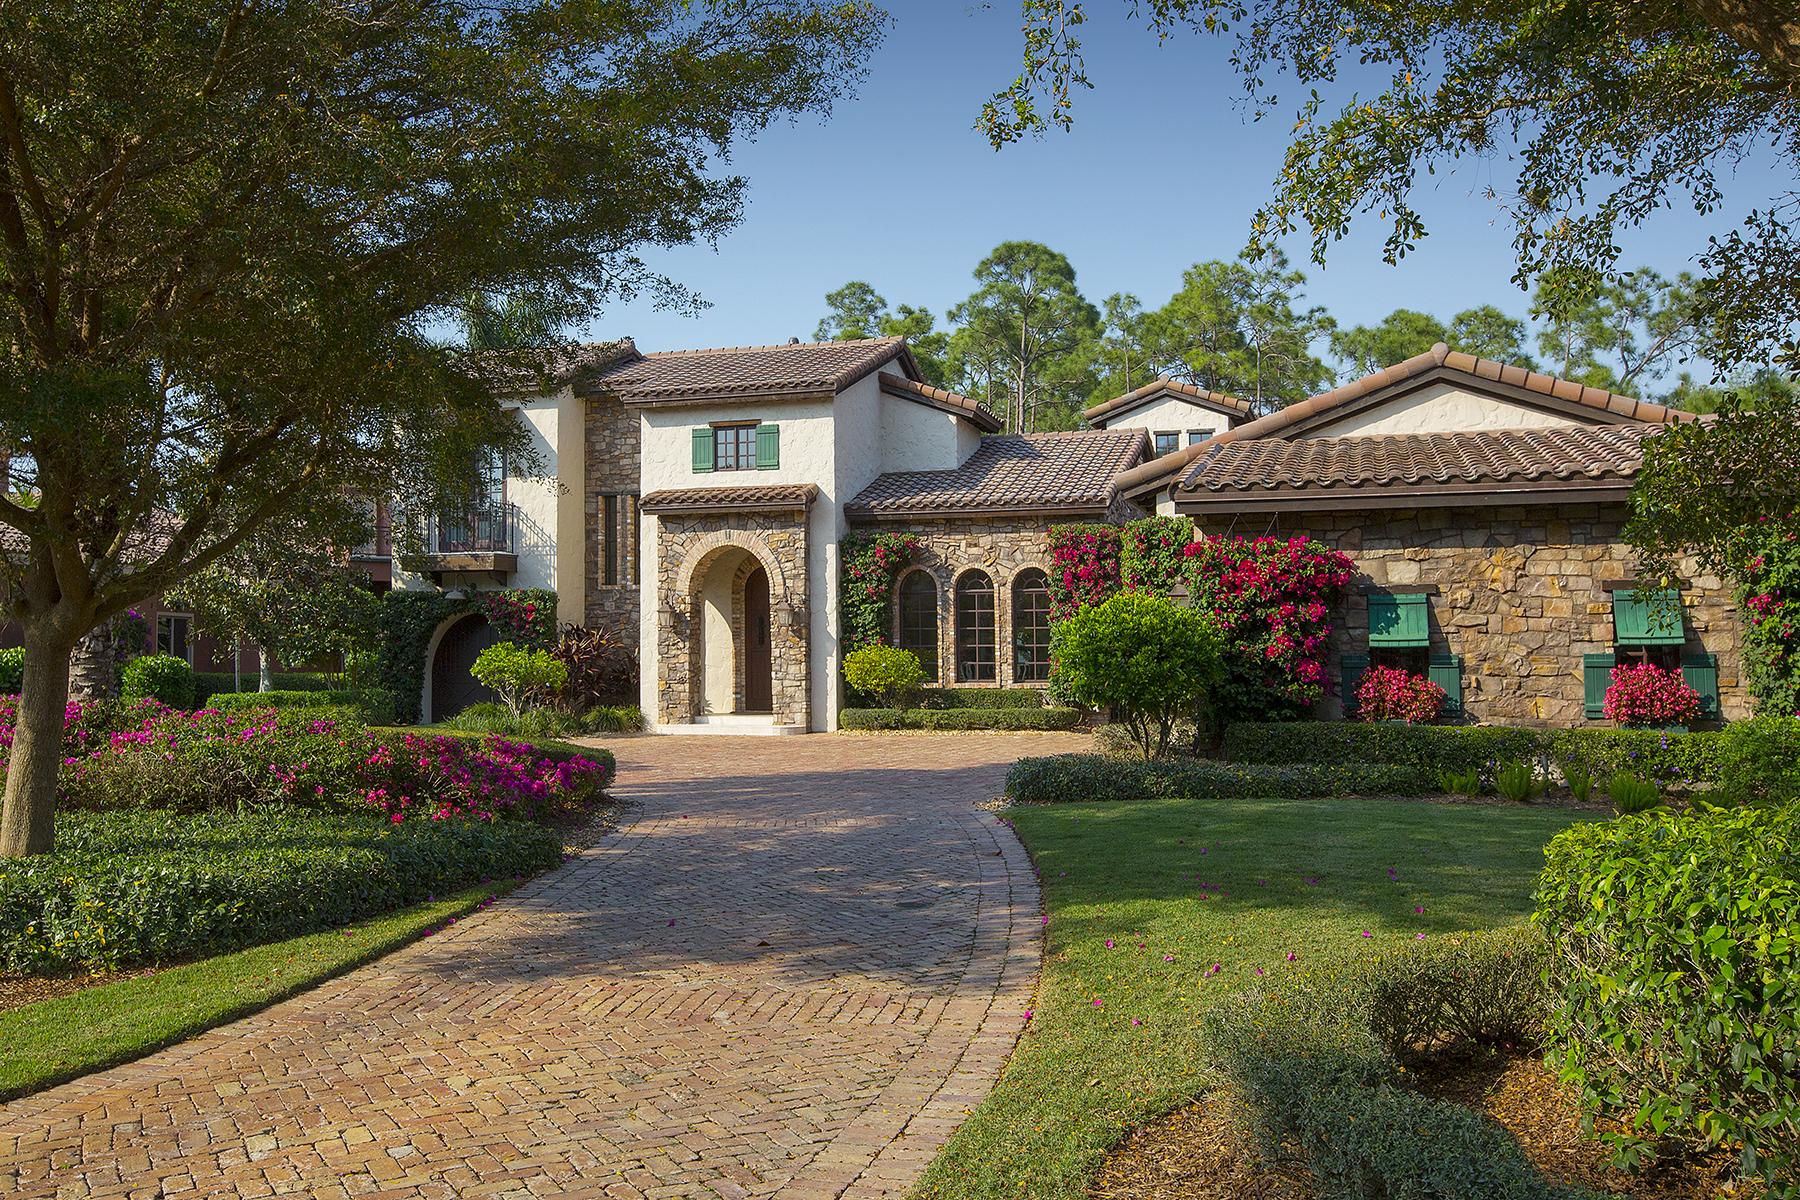 Single Family Home for Sale at MEDITERRA - PADOVA 15151 Brolio Ln, Naples, Florida 34110 United States